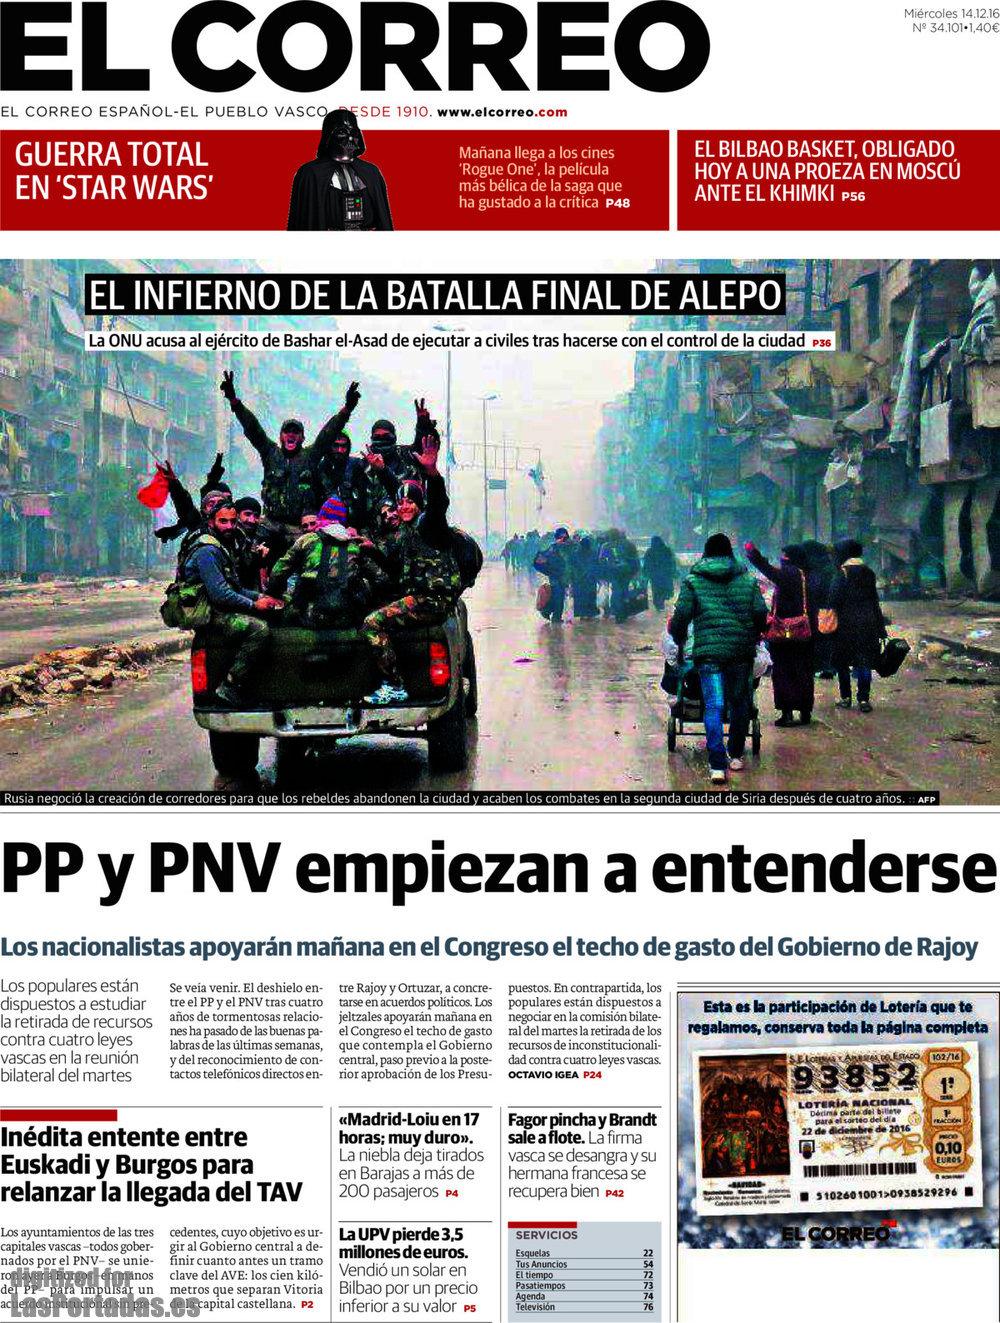 Periodico el correo 14 12 2016 for Correo la 14